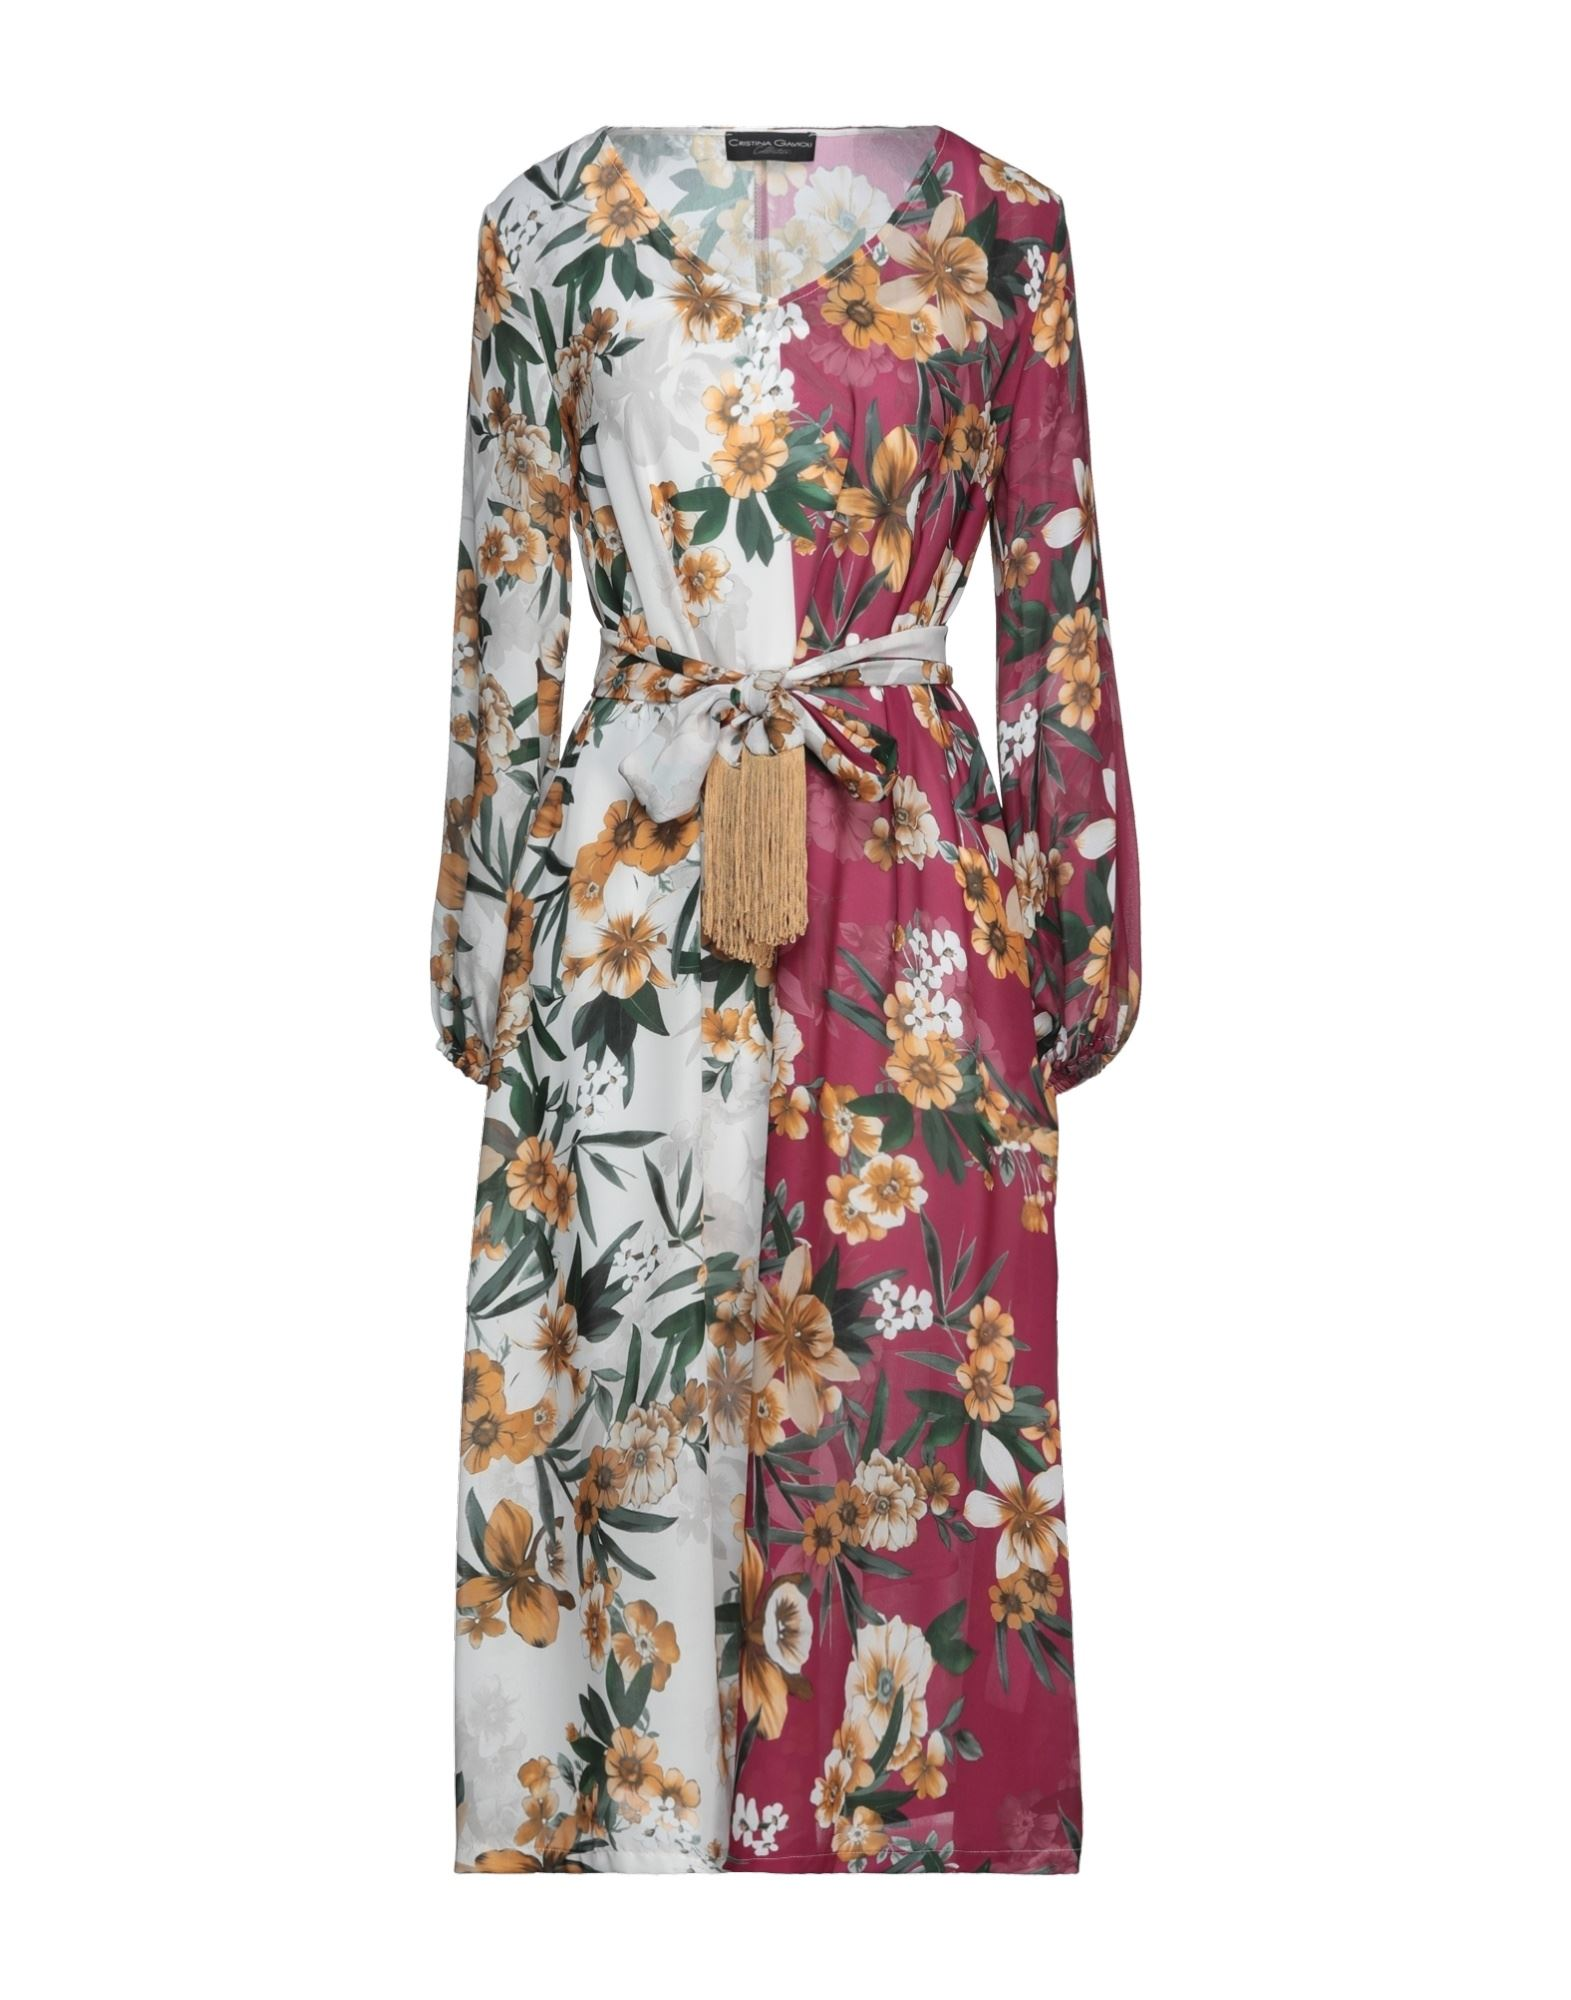 cristina gavioli collection длинное платье CRISTINA GAVIOLI Платье миди